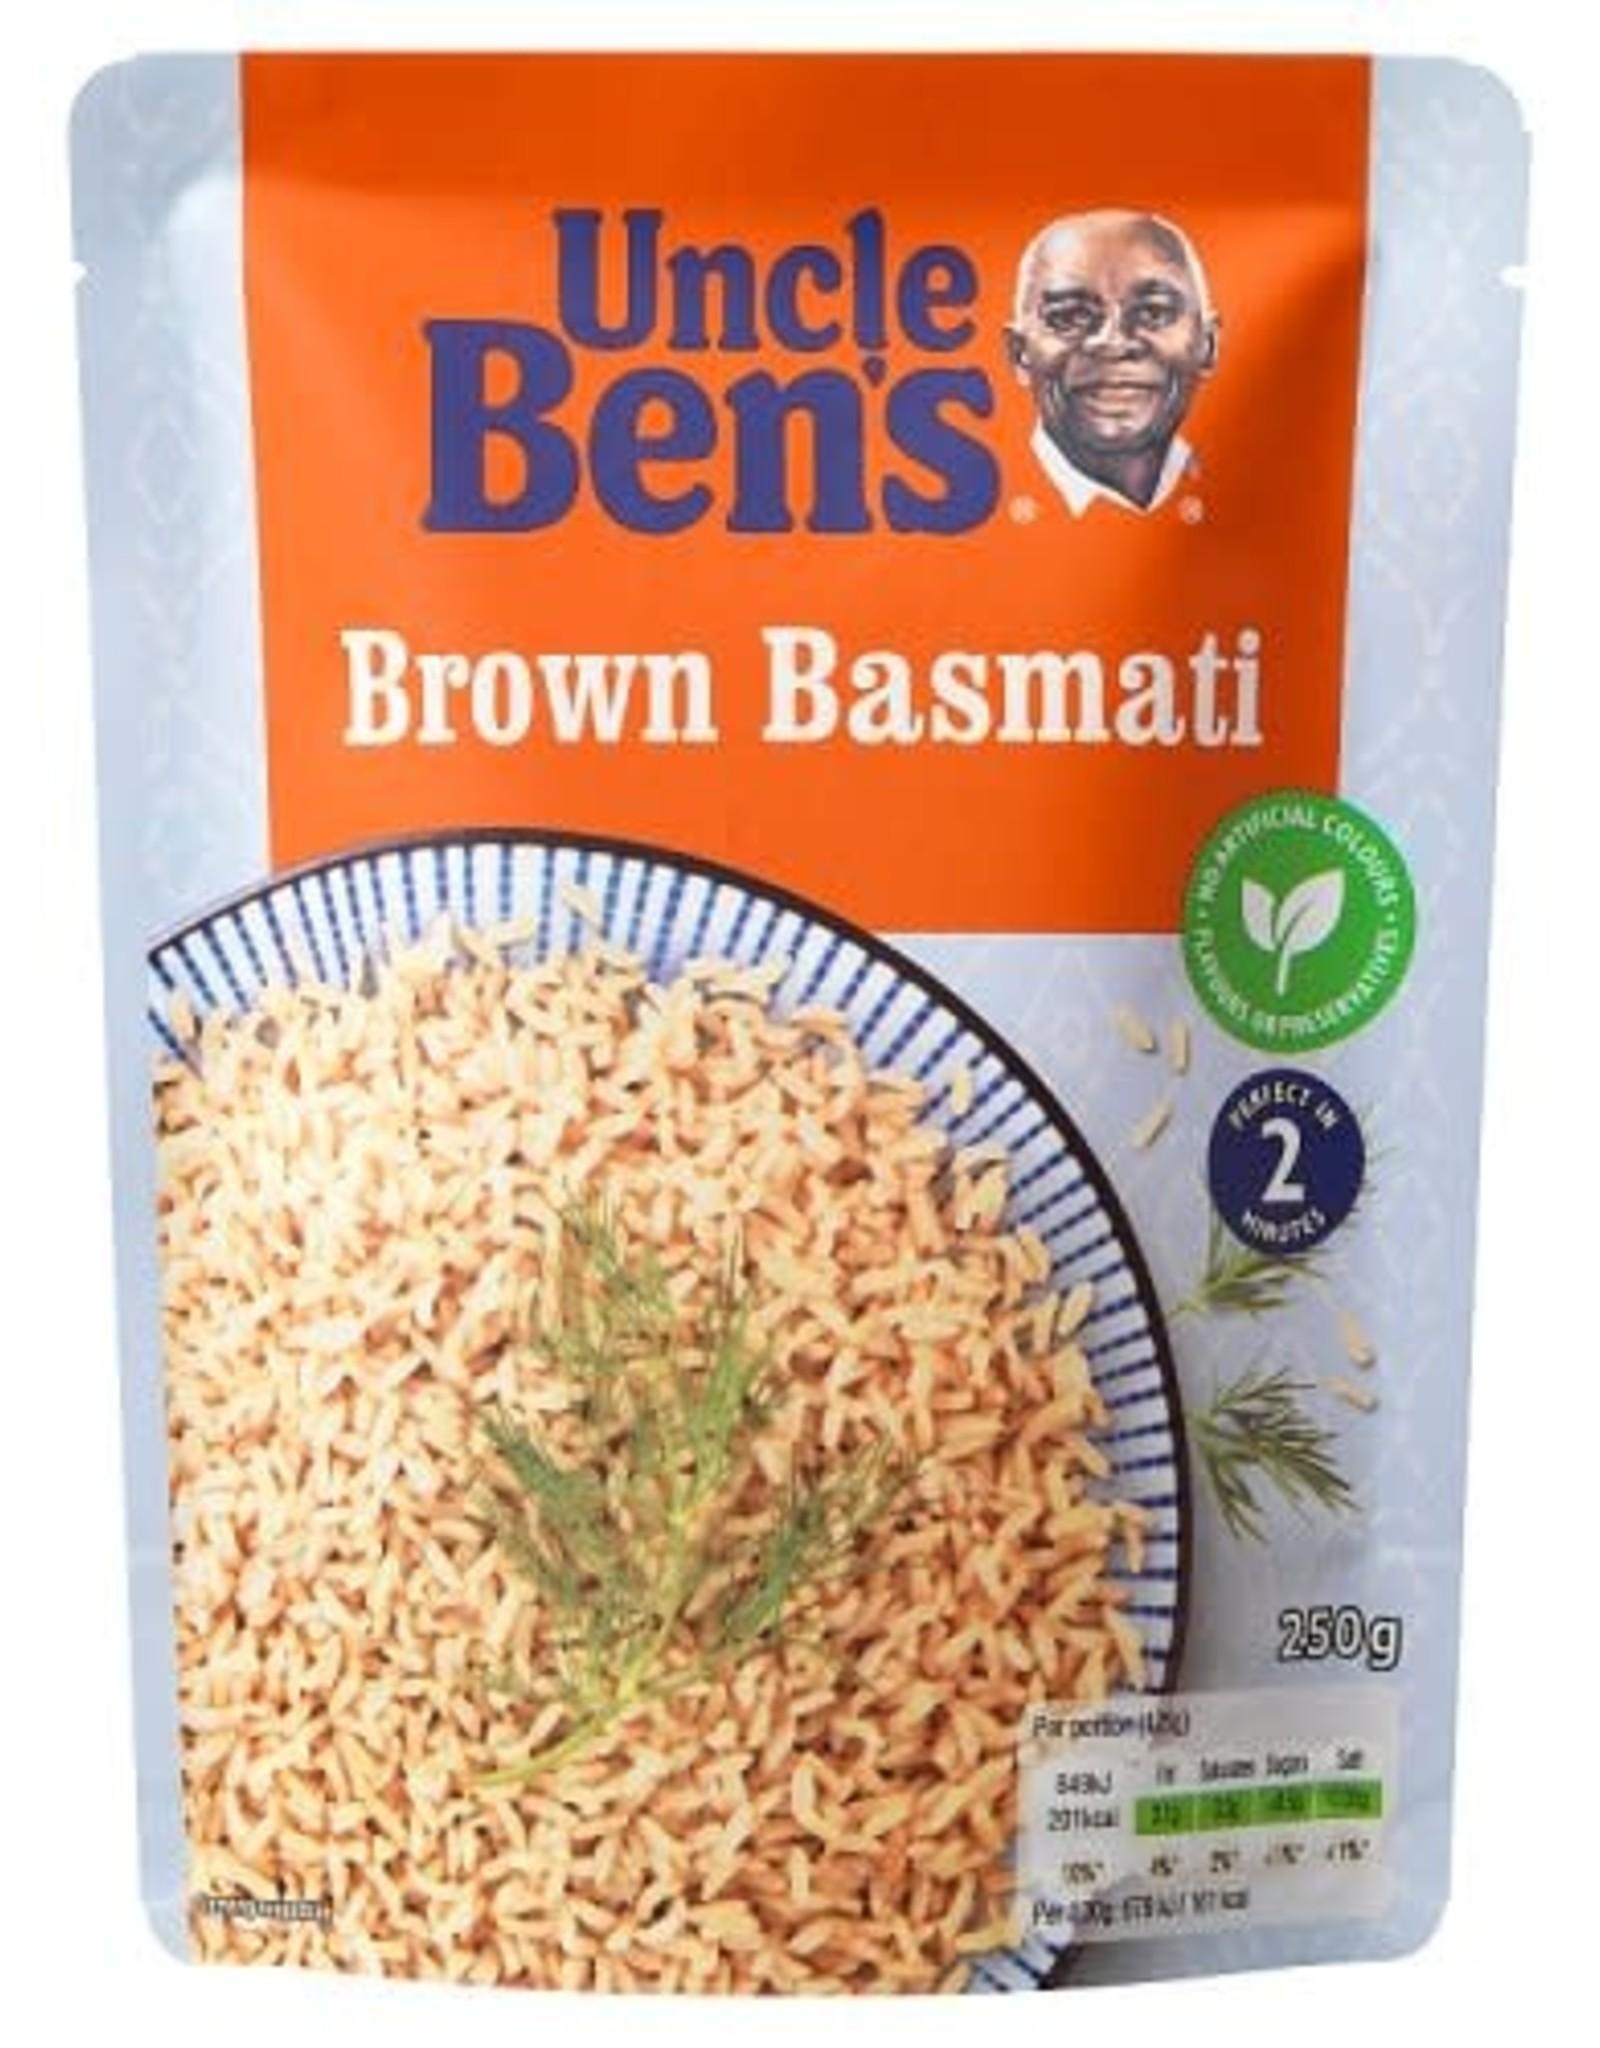 Uncle Bens Copy of Uncle Bens Basmati 250 g